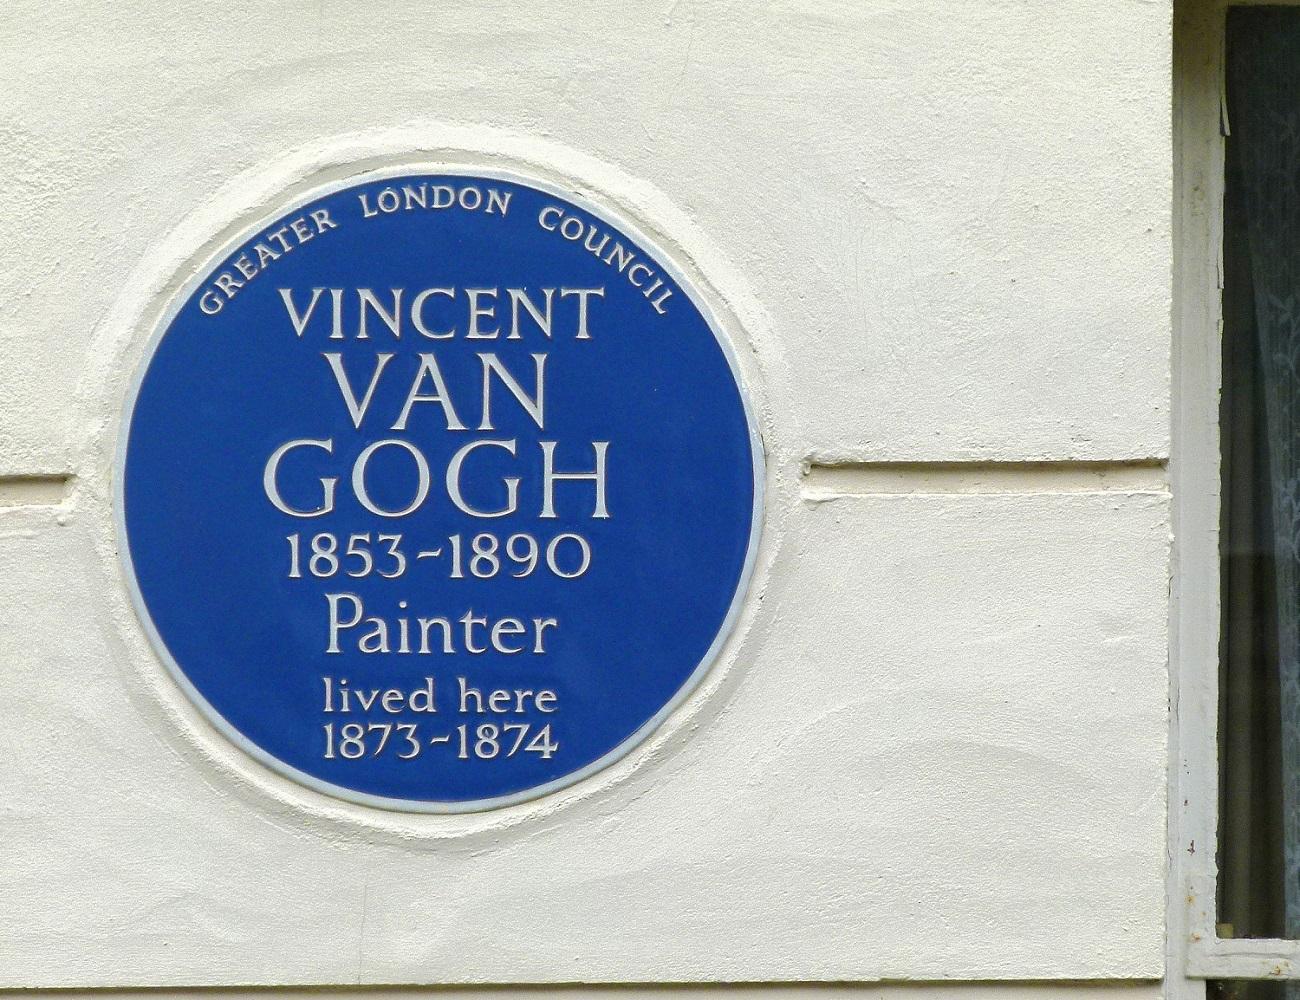 Targa commemorativa sulla facciata della casa di van Gogh a Londra